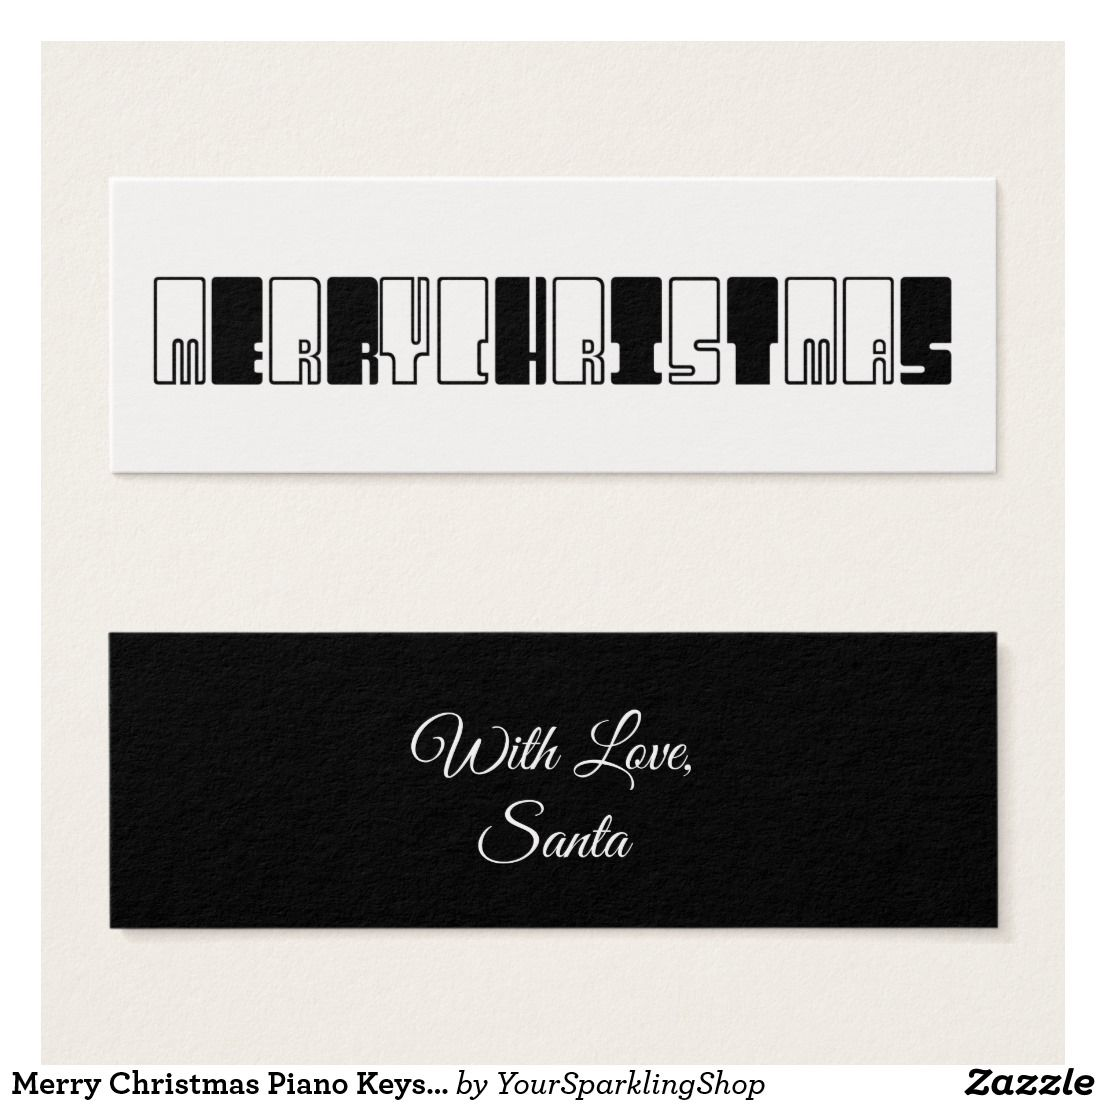 Merry Christmas Piano Keys Typography Black White | Pinterest ...